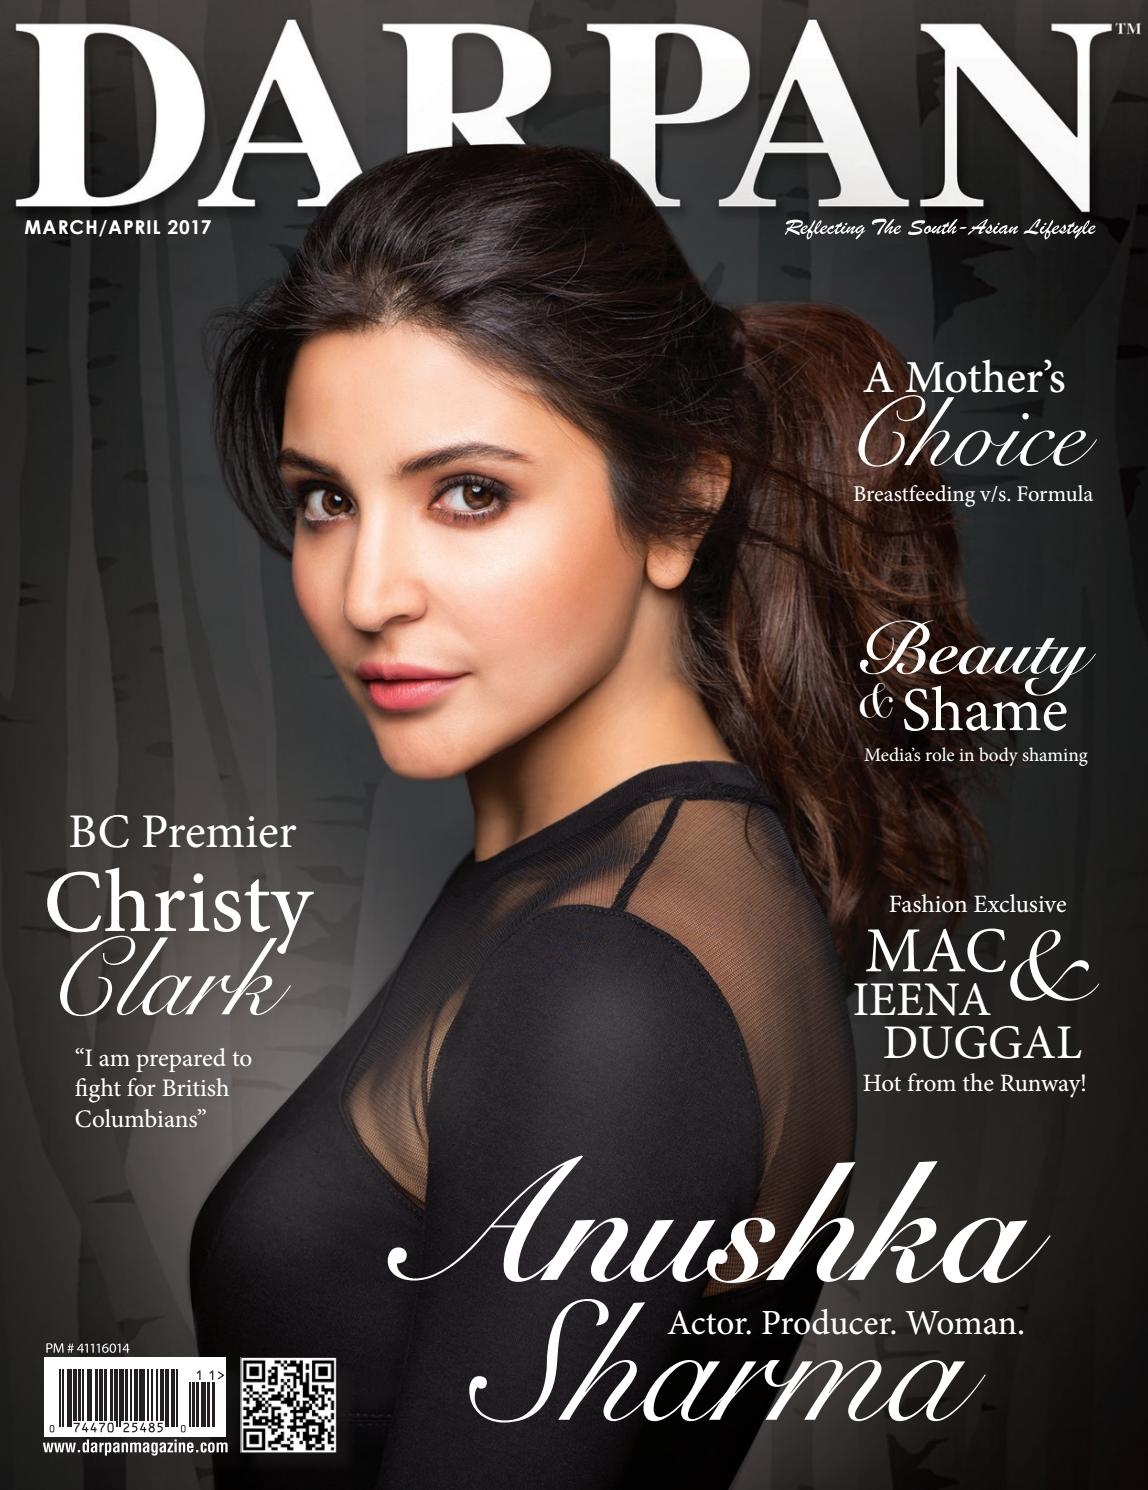 darpan mag by darpan magazine issuu